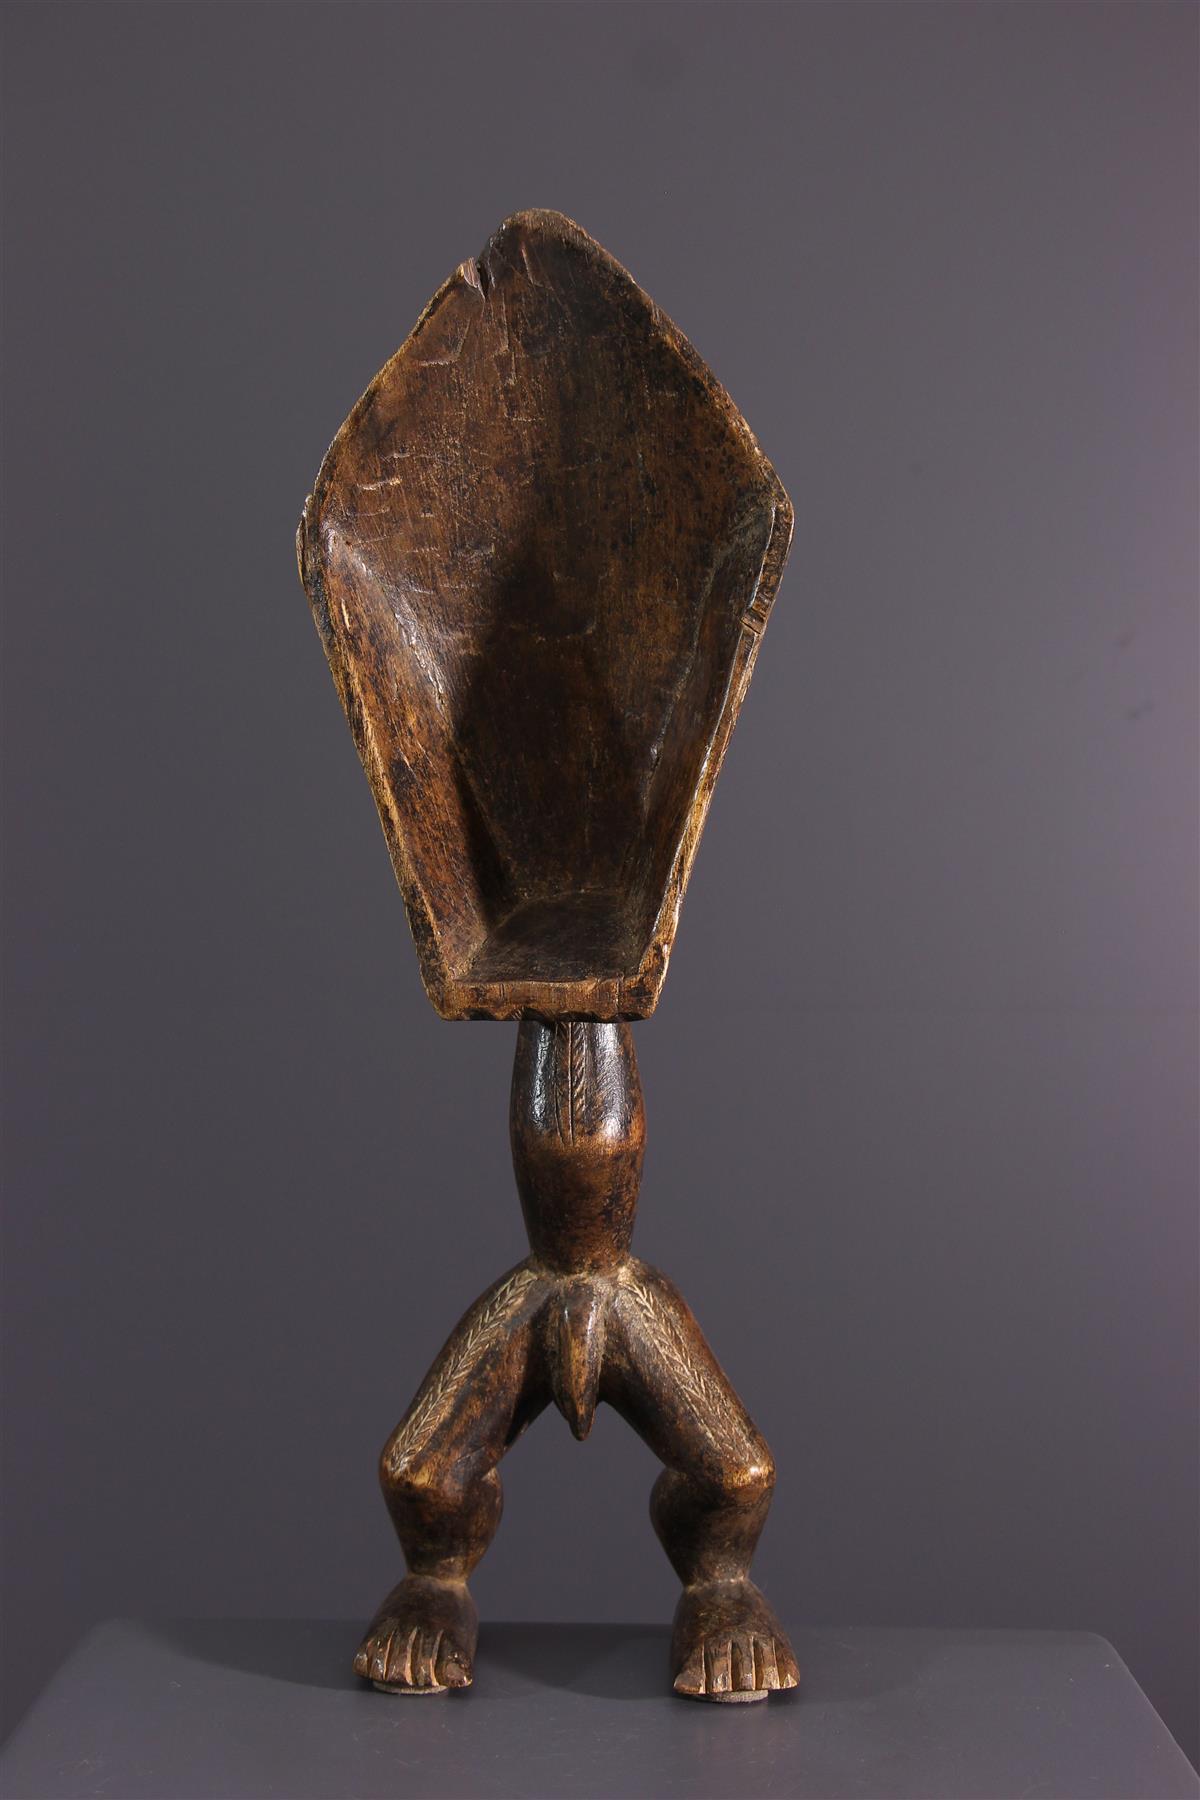 Dan Spoon - African art